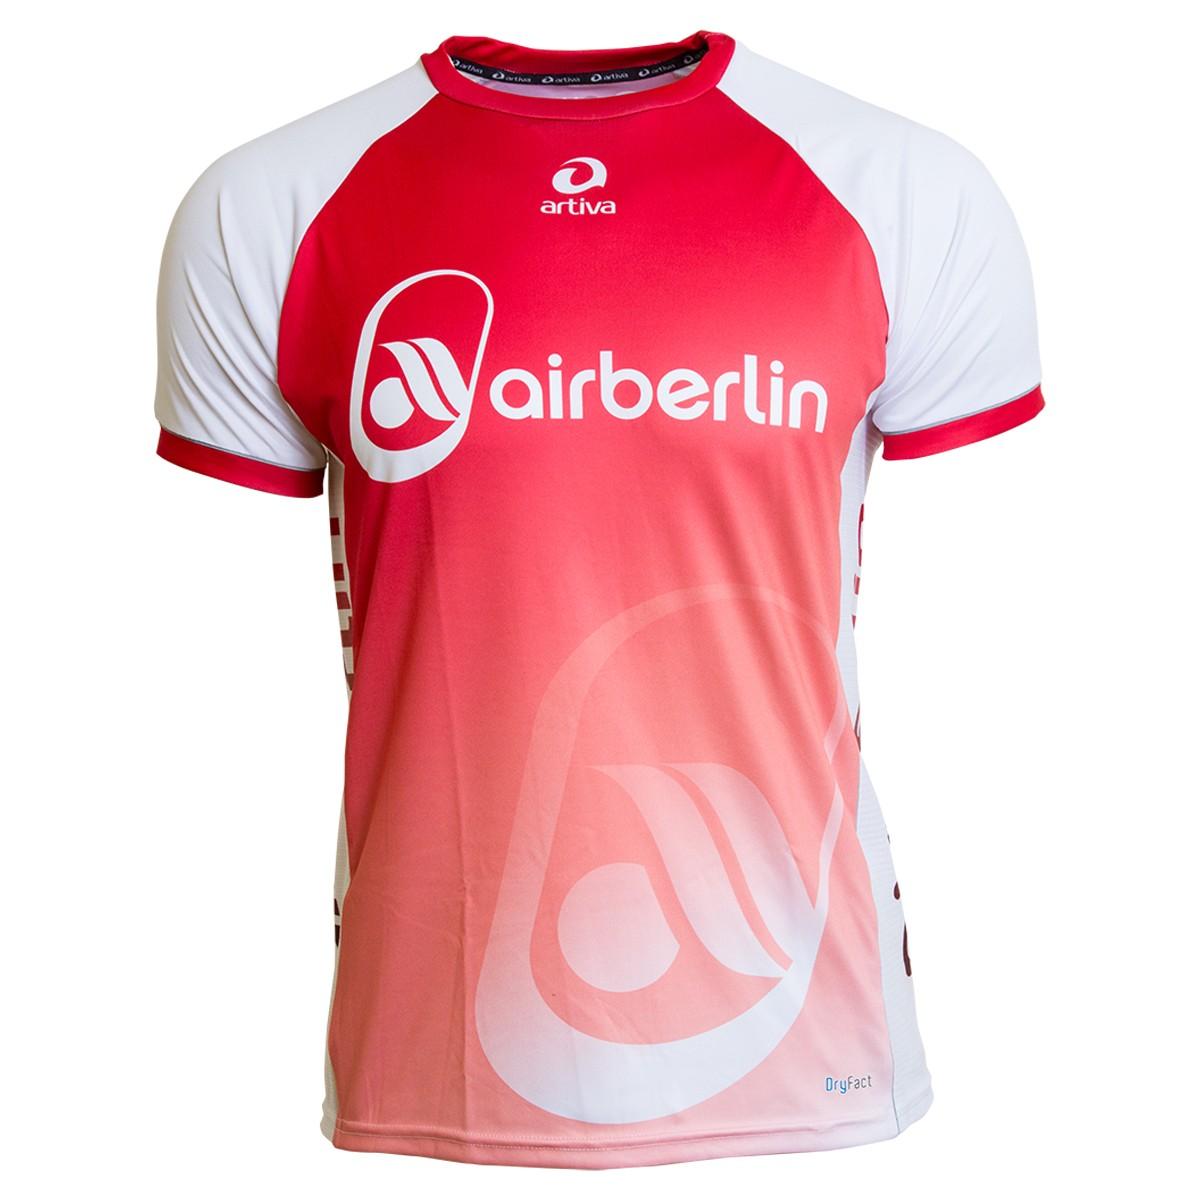 Laufshirt - airberlin